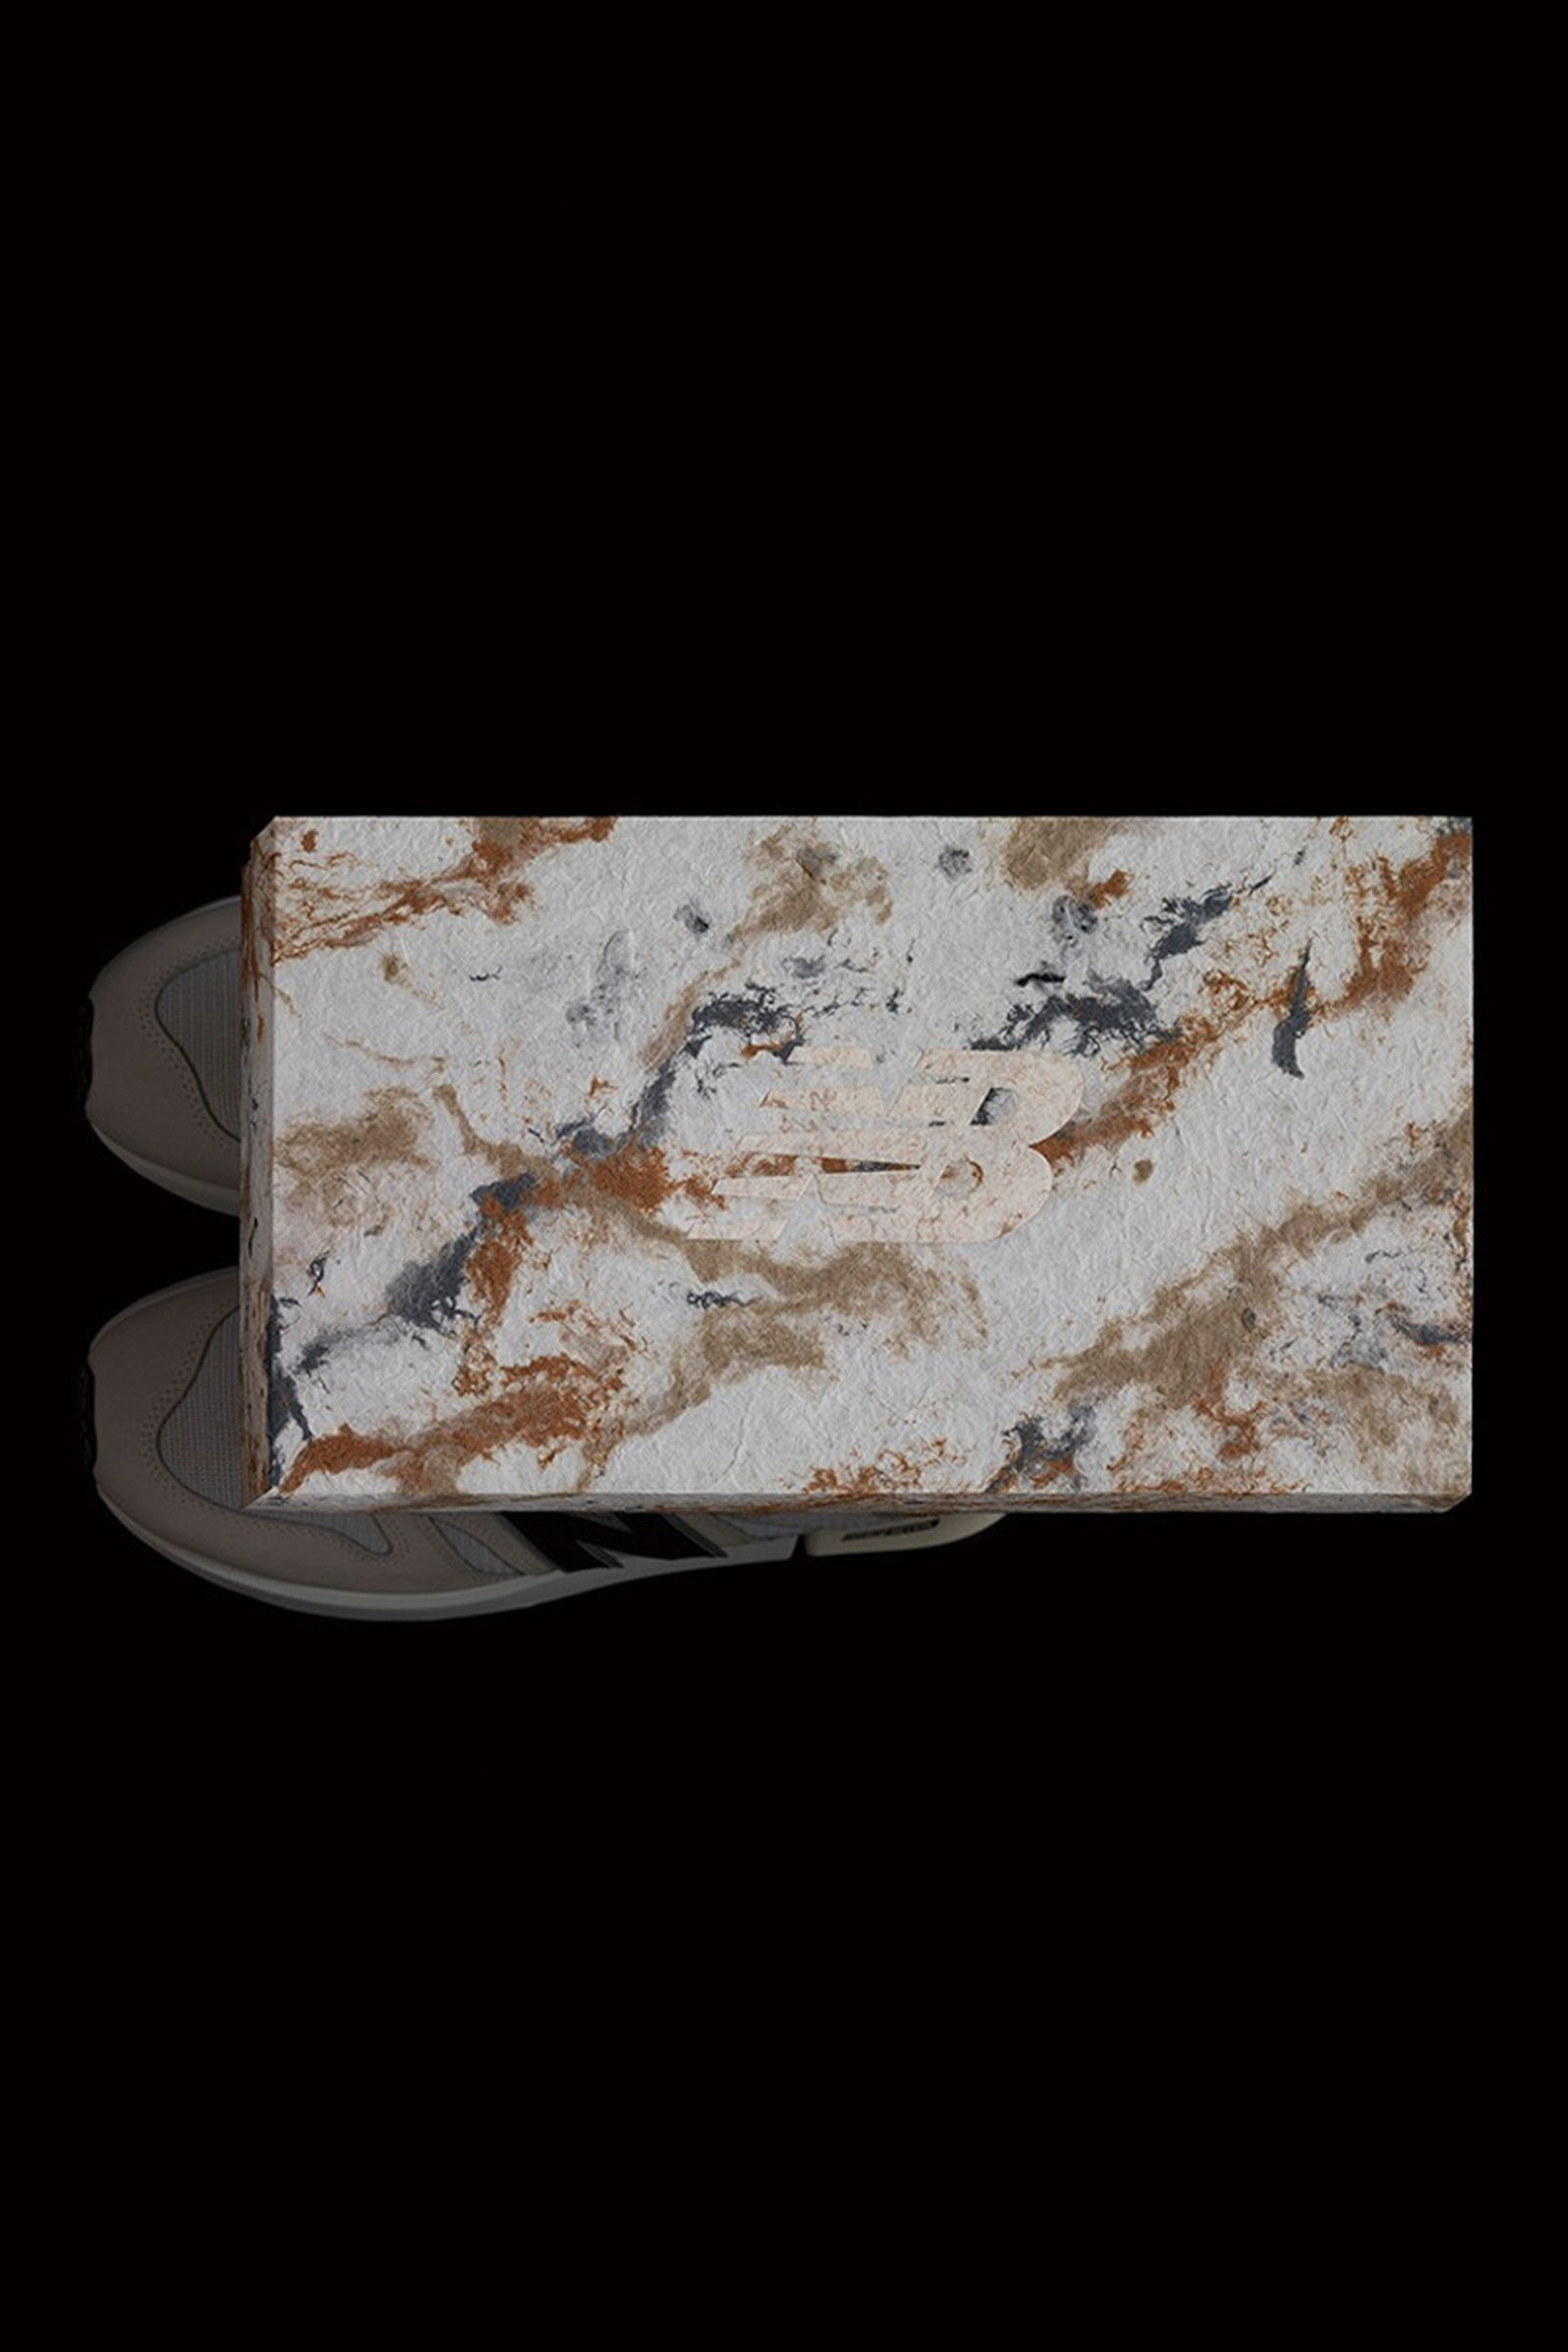 yoshihisa-tanaka-new-balance-shoebox-03